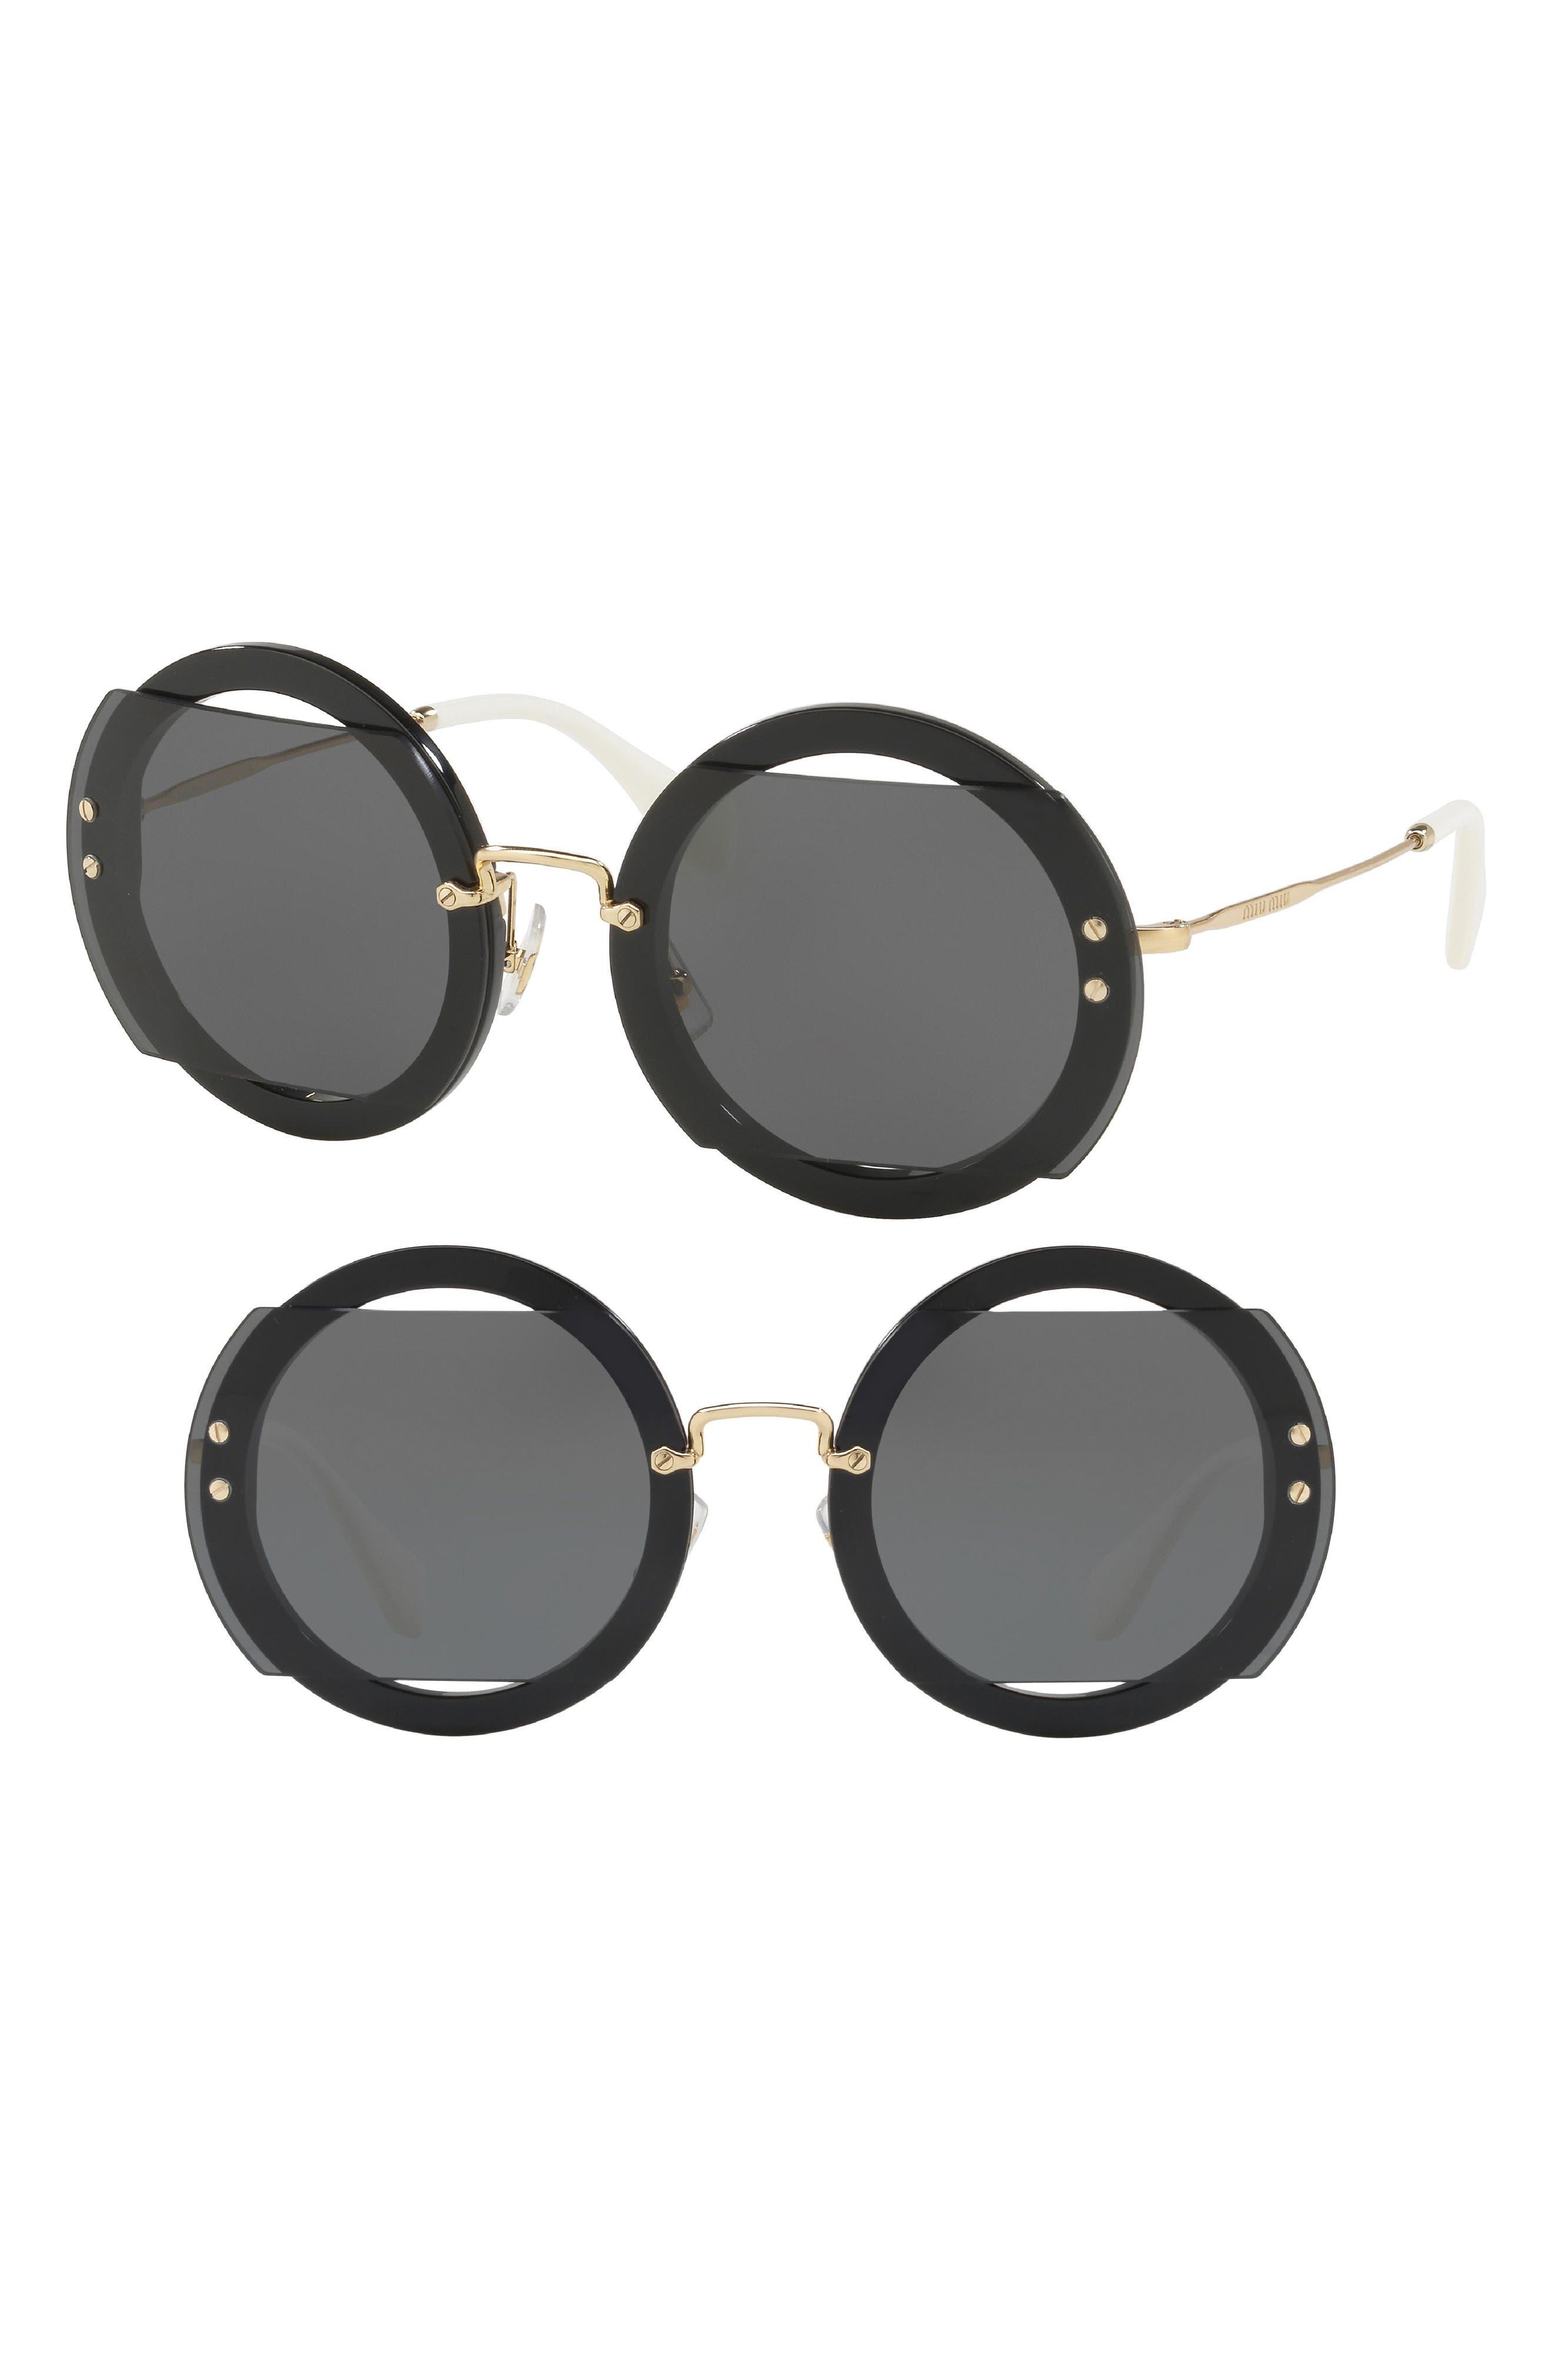 63mm Round Sunglasses,                             Main thumbnail 1, color,